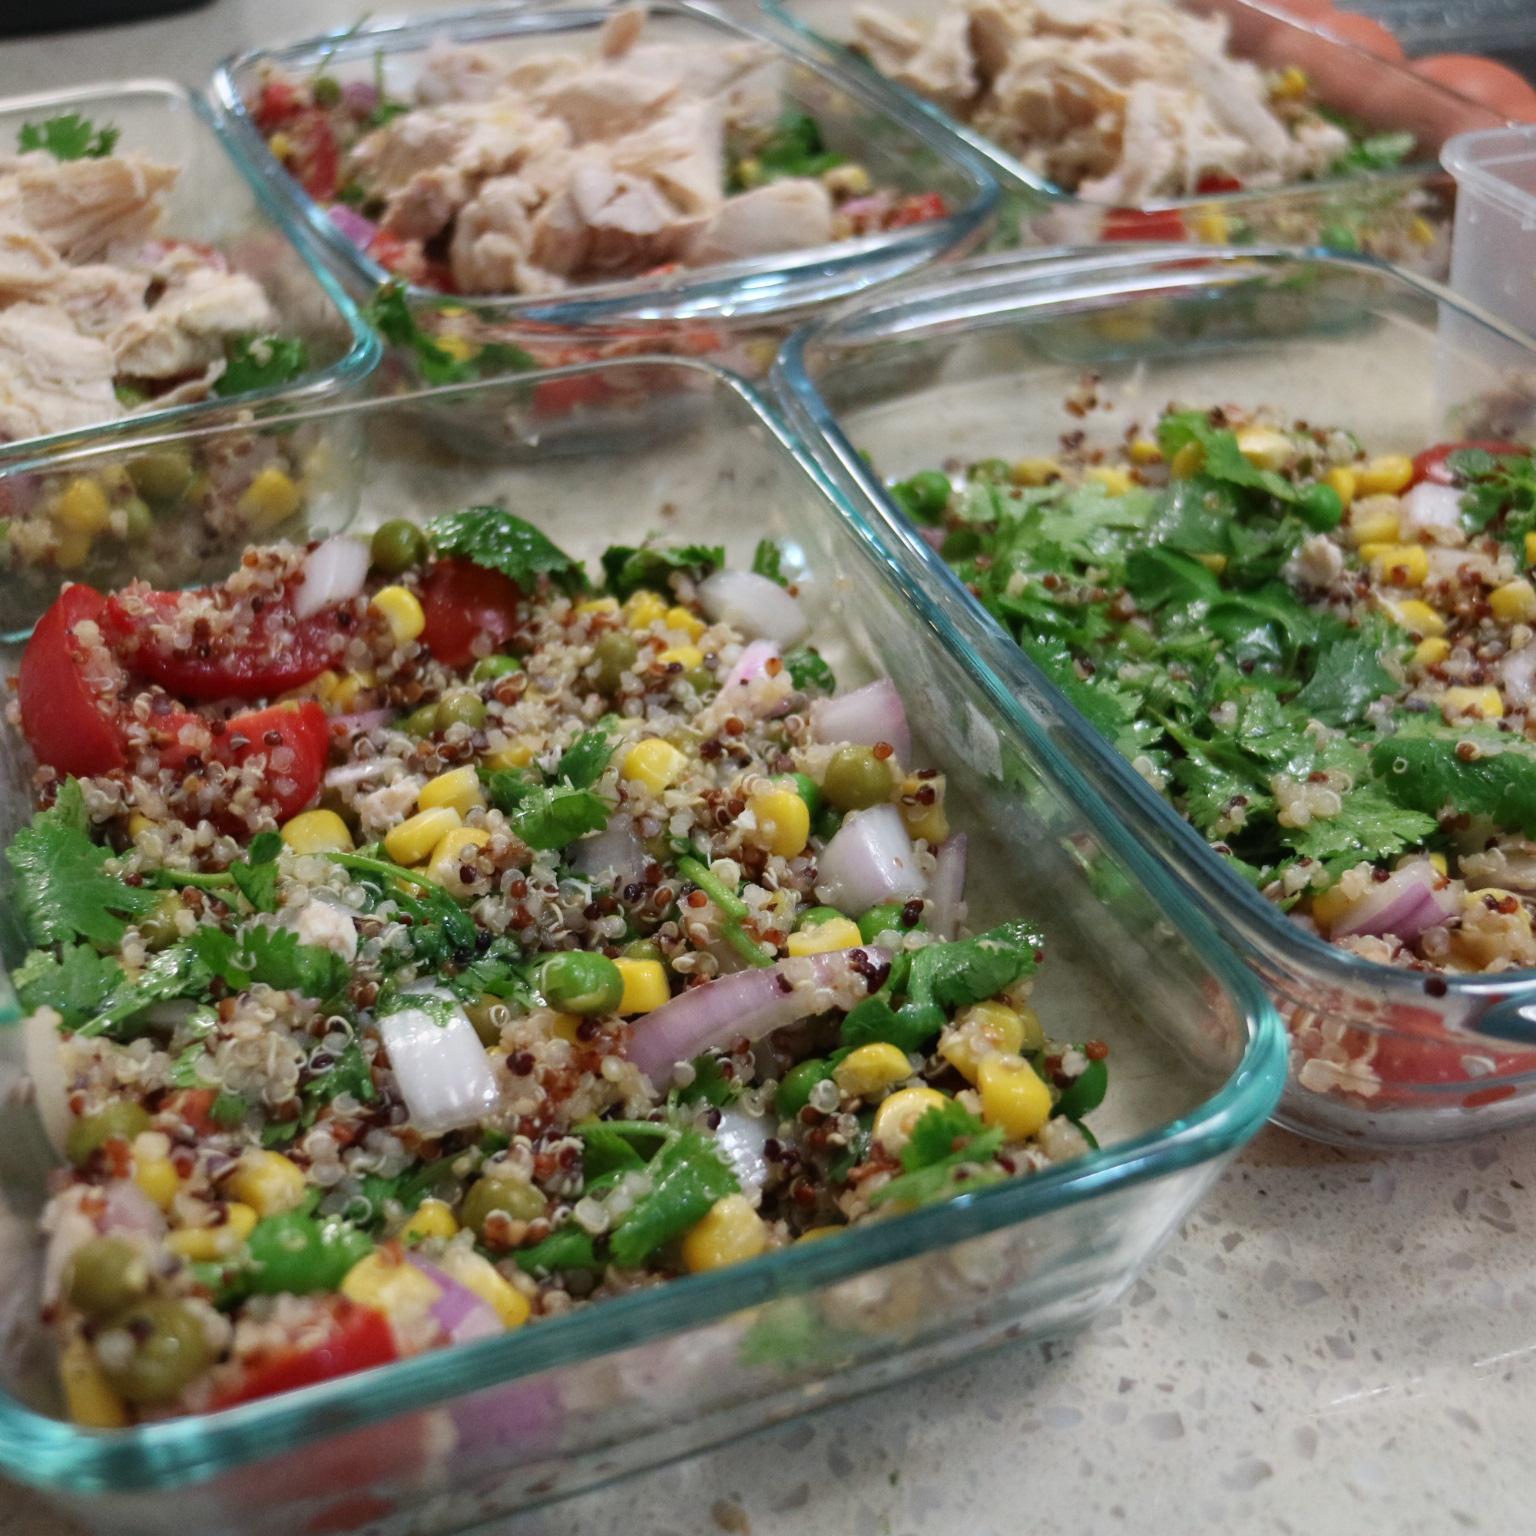 Meal-Prep_Chicken-Mexican-Salad.jpg